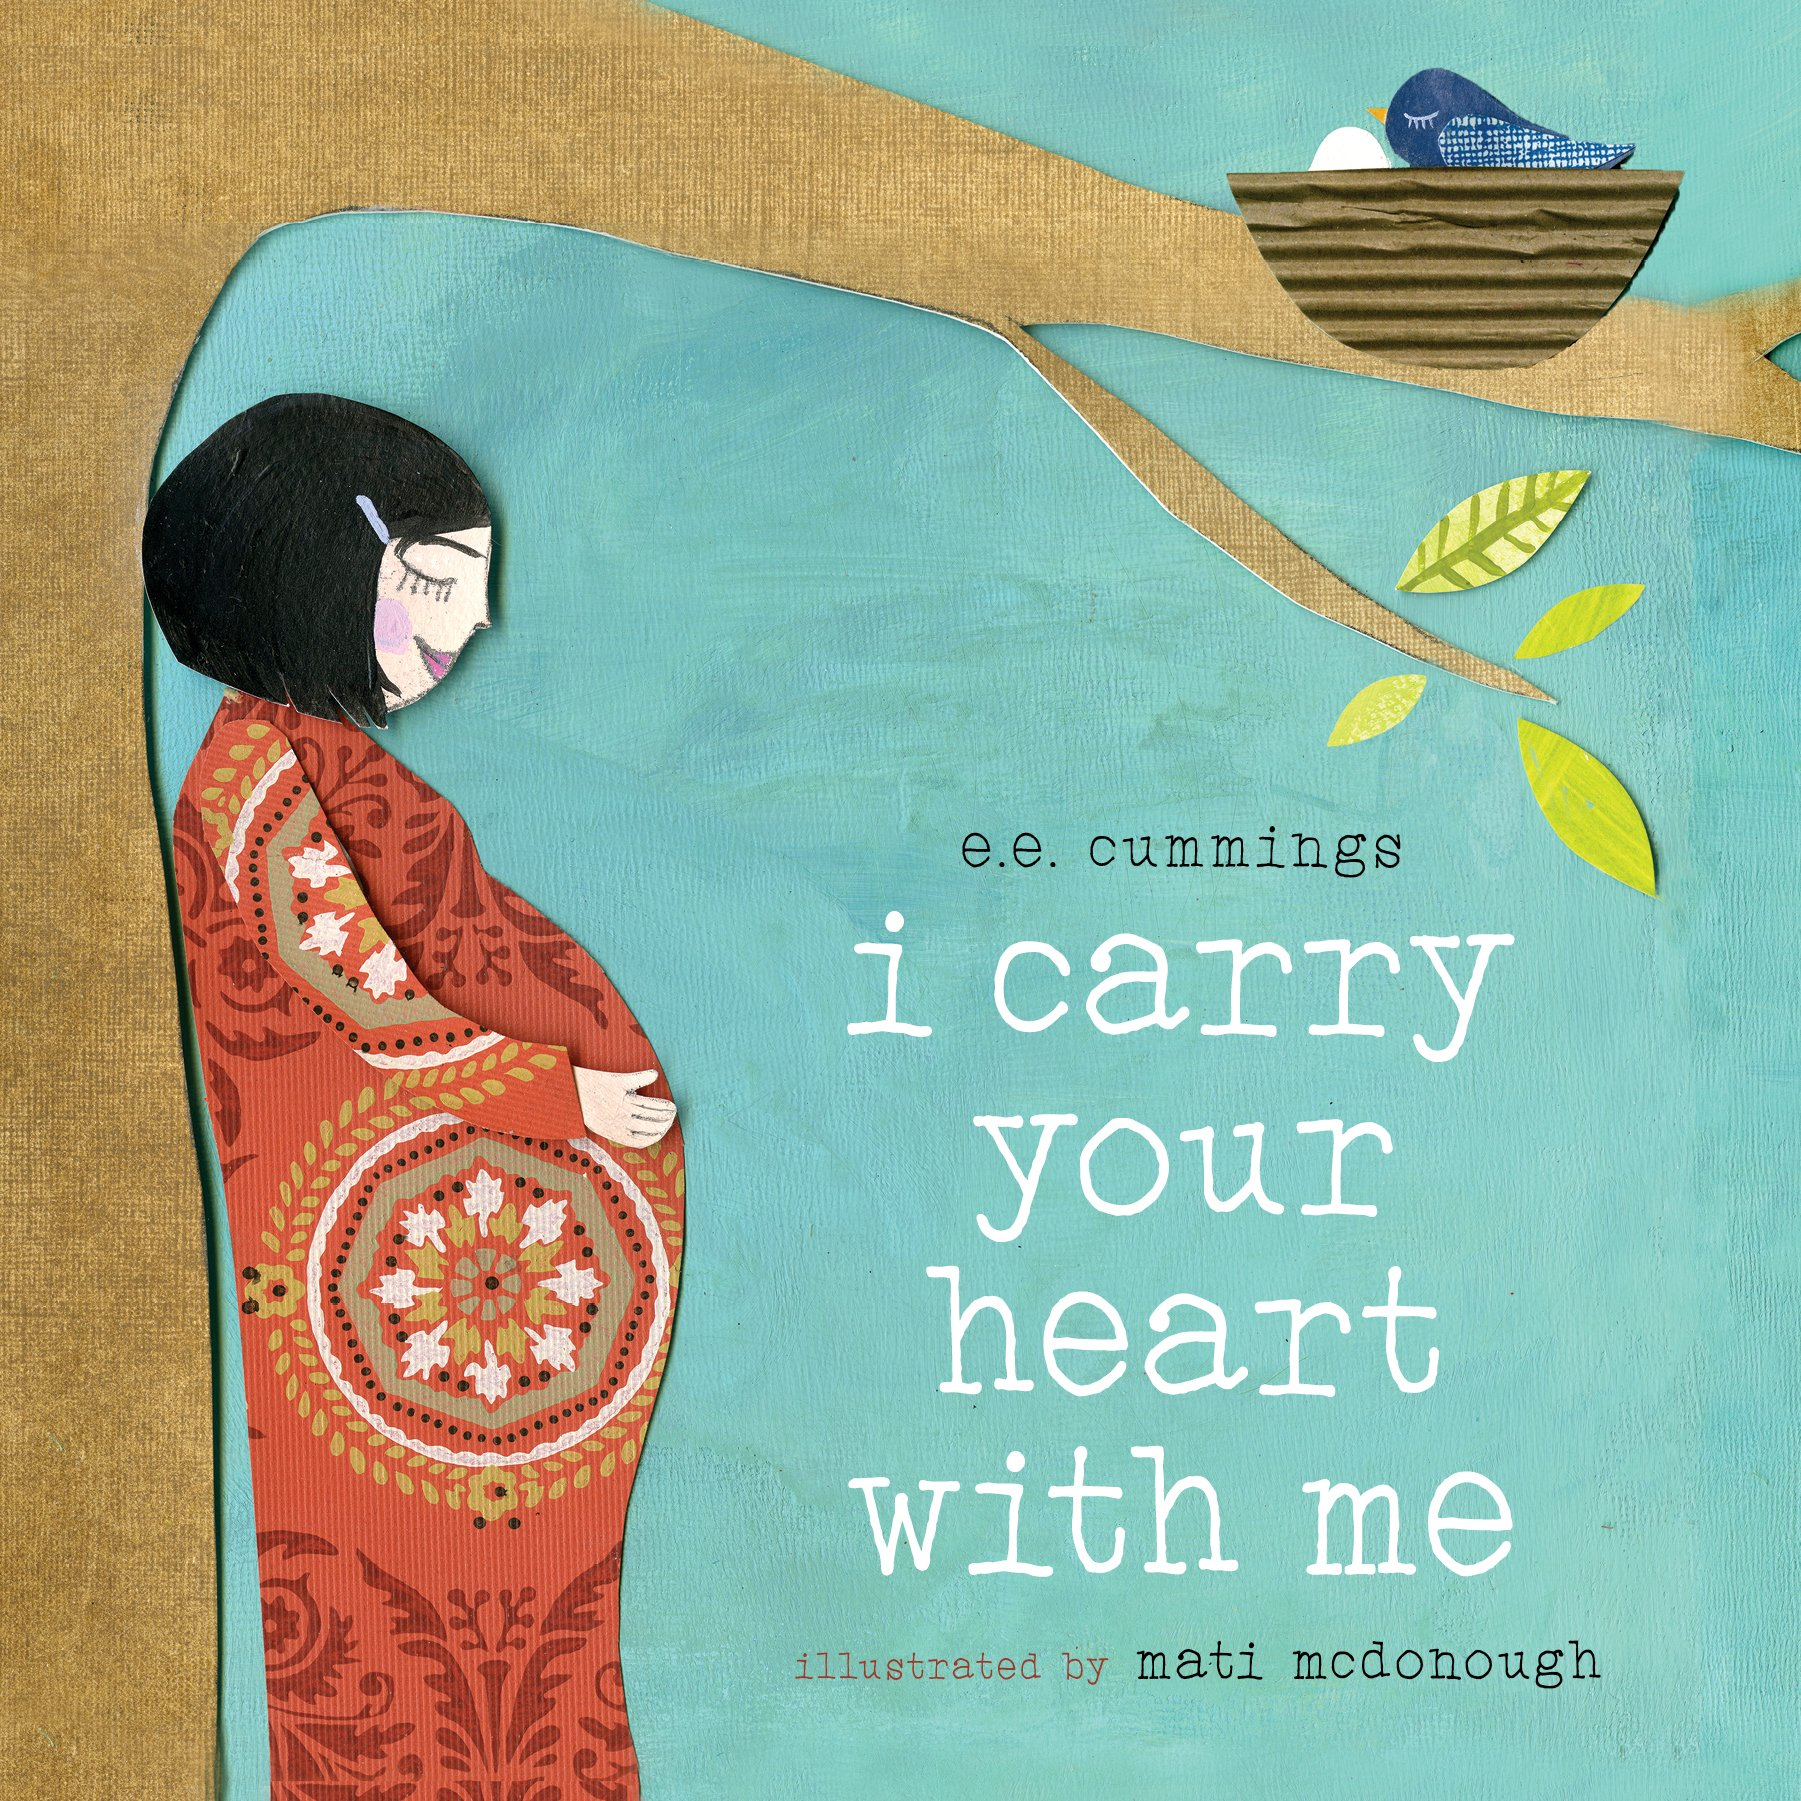 I Carry Your Heart With Me 9781944903206 Cummings E E Mcdonough Mati Books